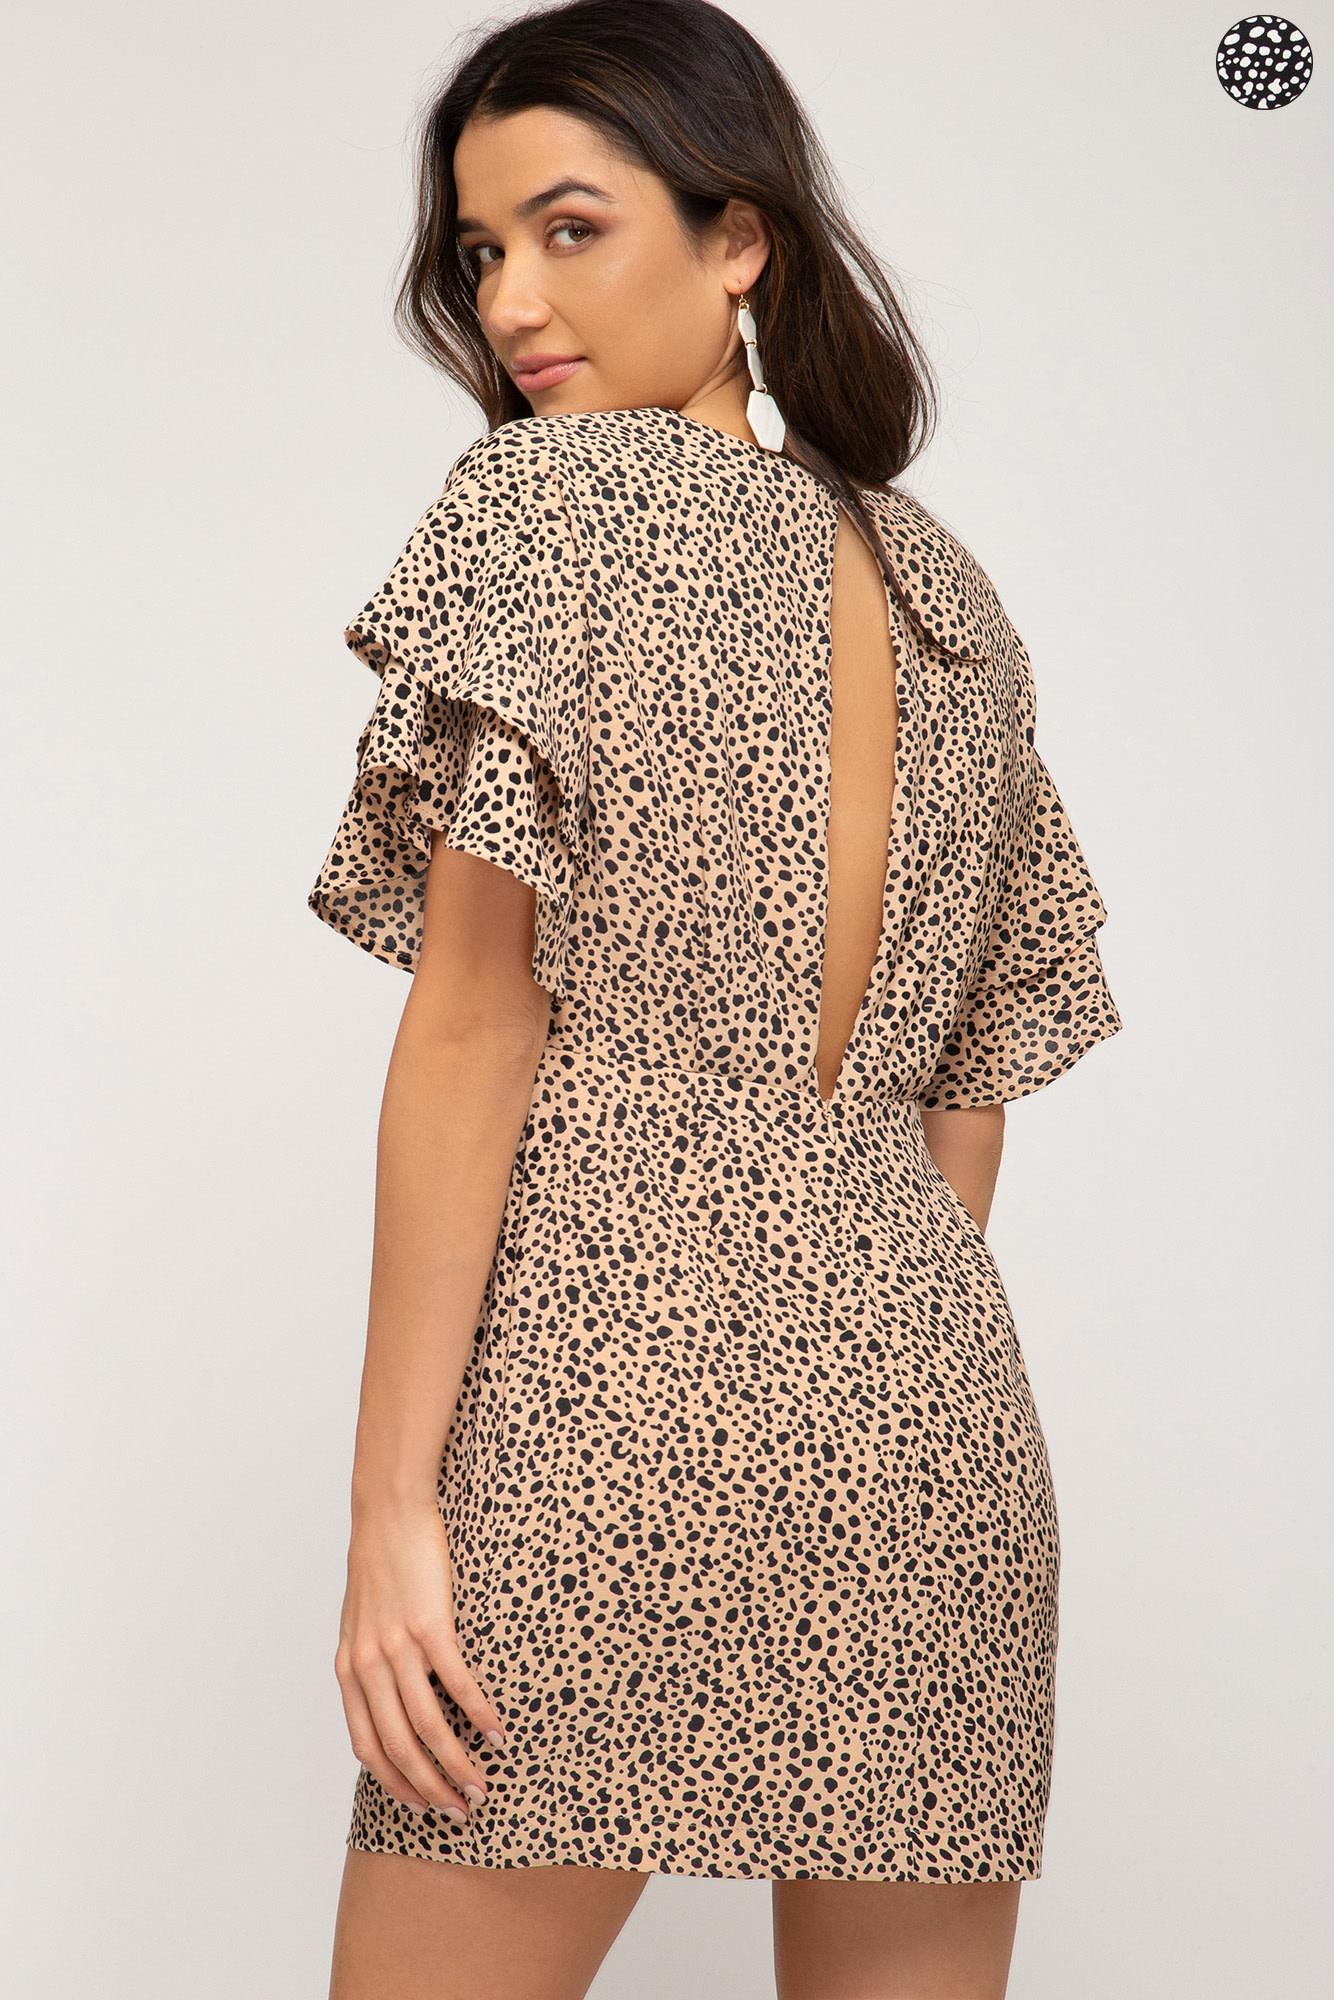 Haute Mama Animal Print Dress -